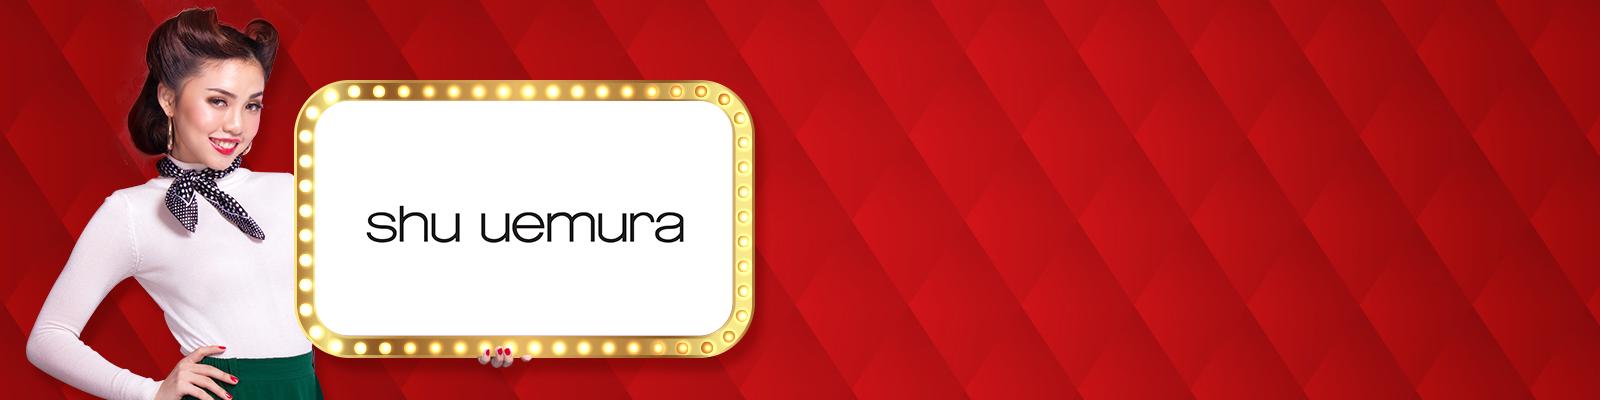 Shu Uemura promo